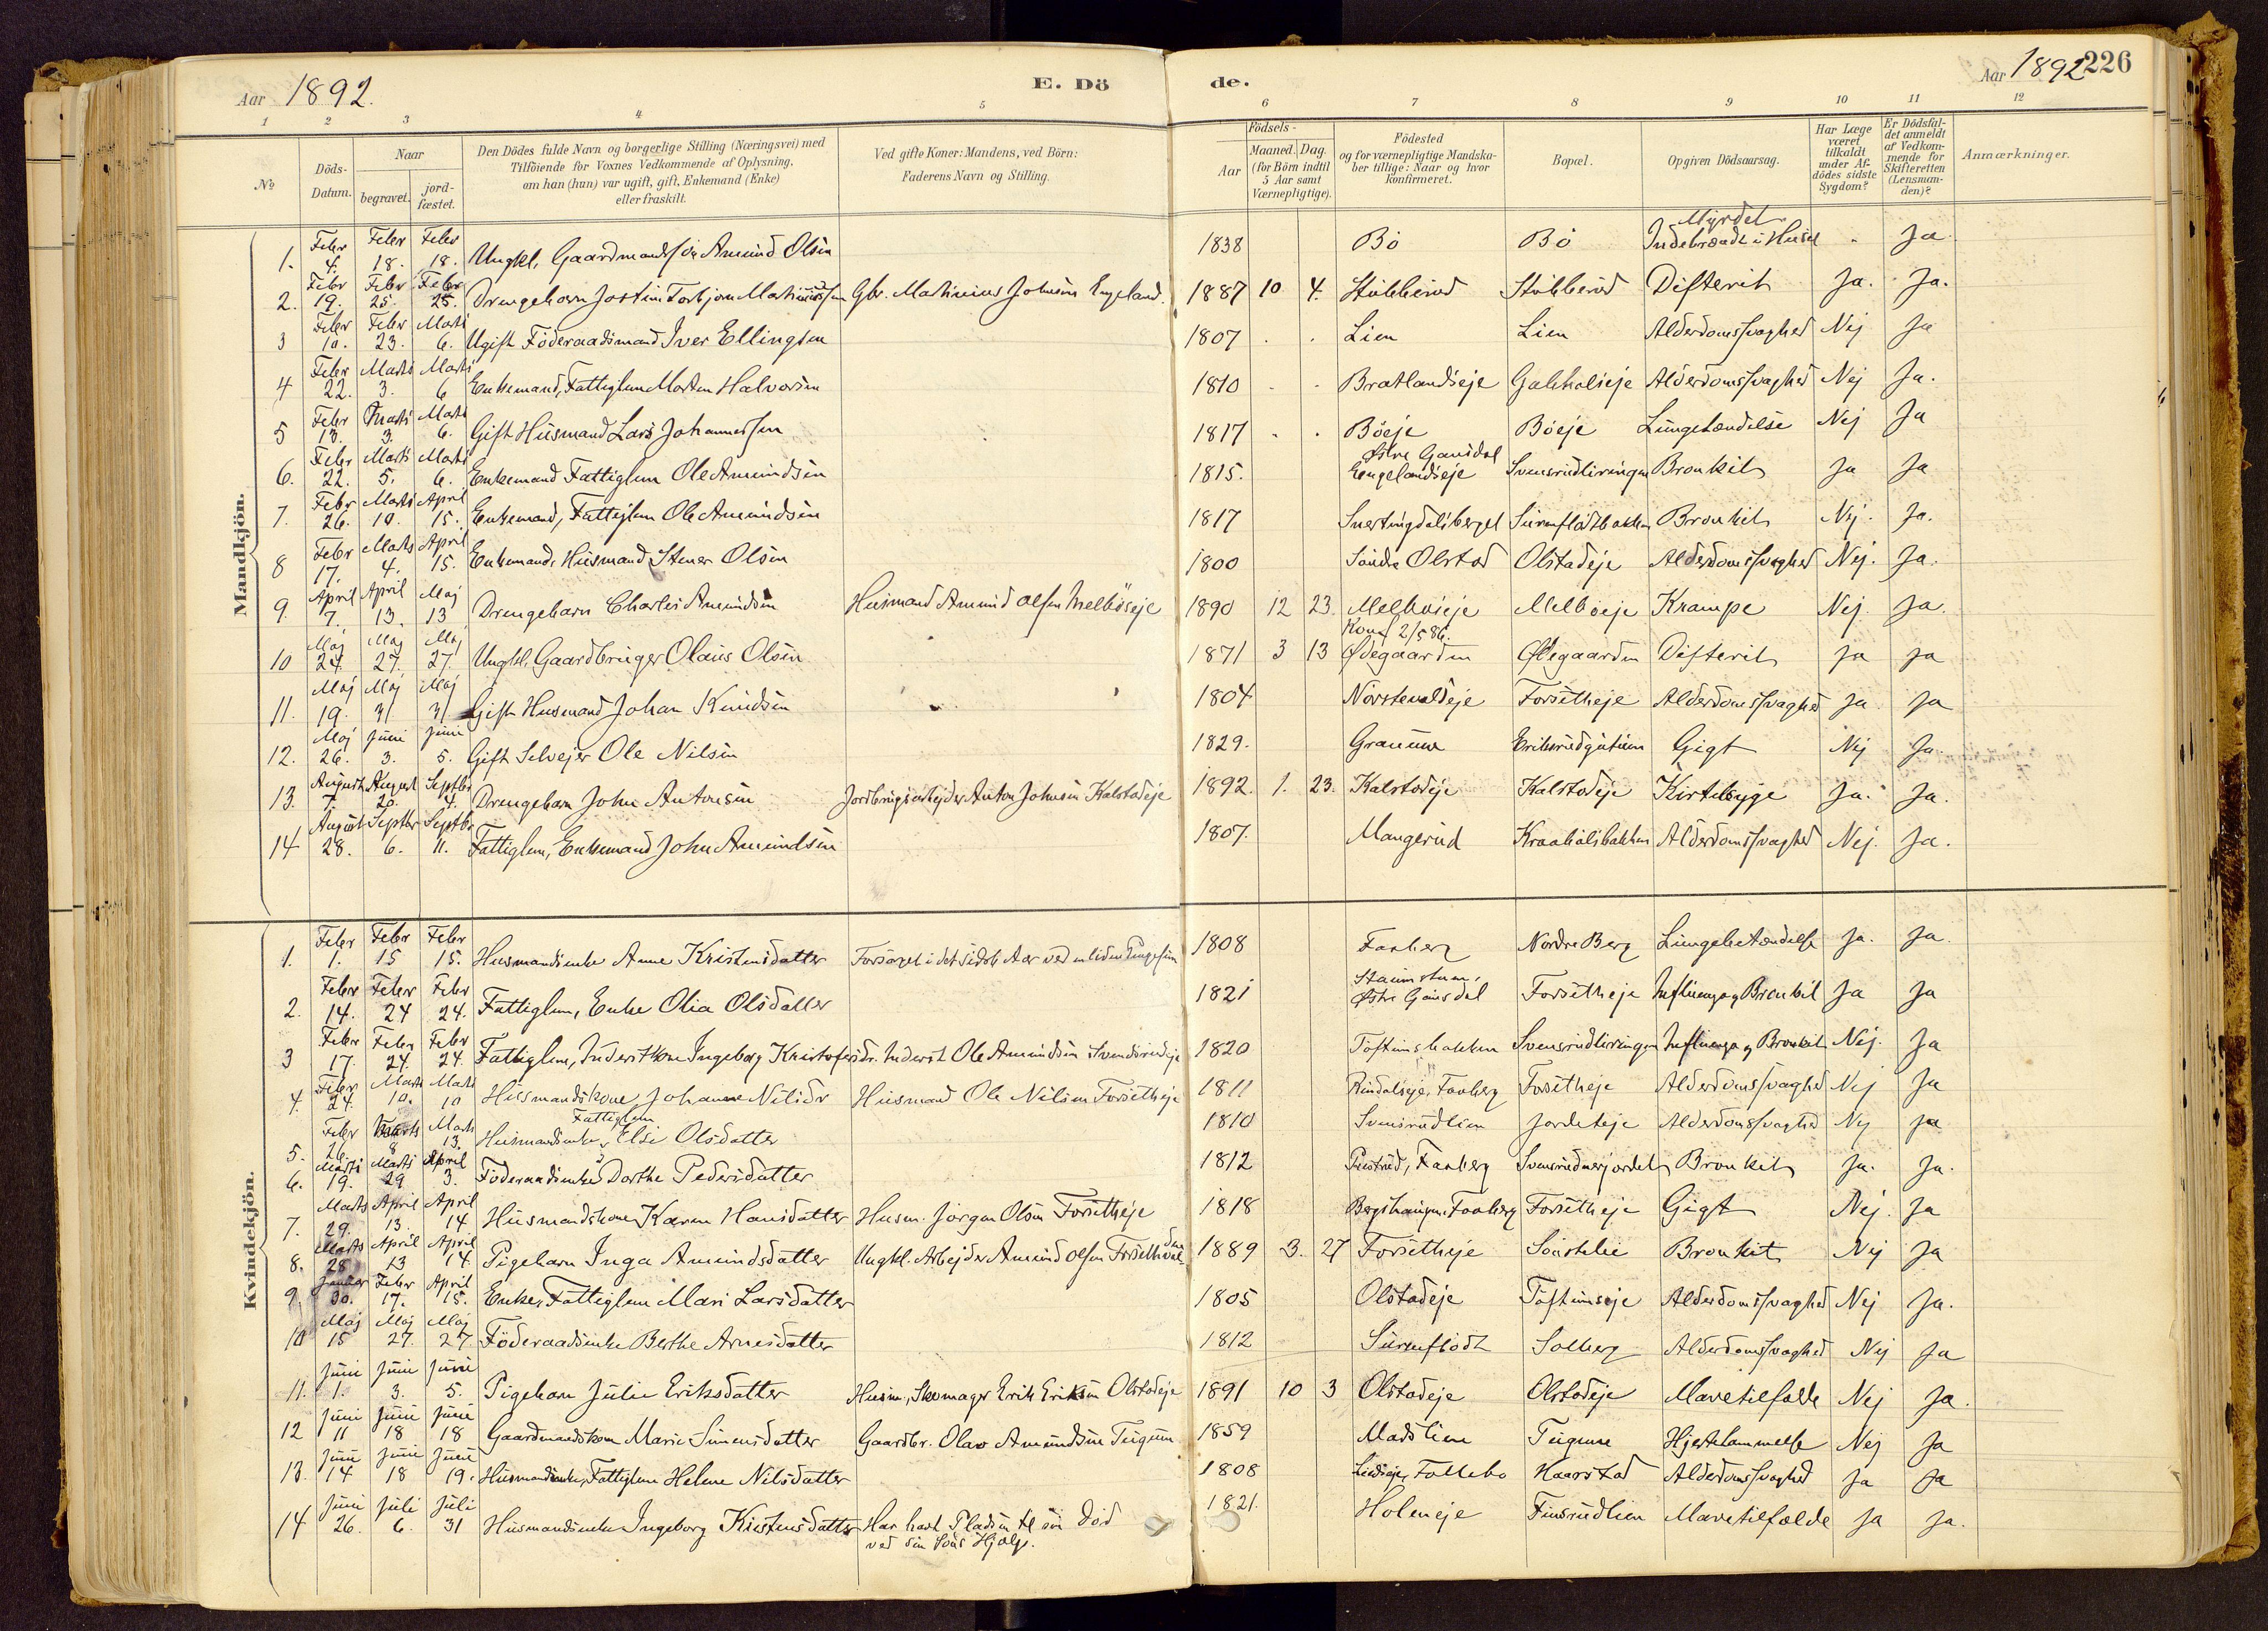 SAH, Vestre Gausdal prestekontor, Ministerialbok nr. 1, 1887-1914, s. 226